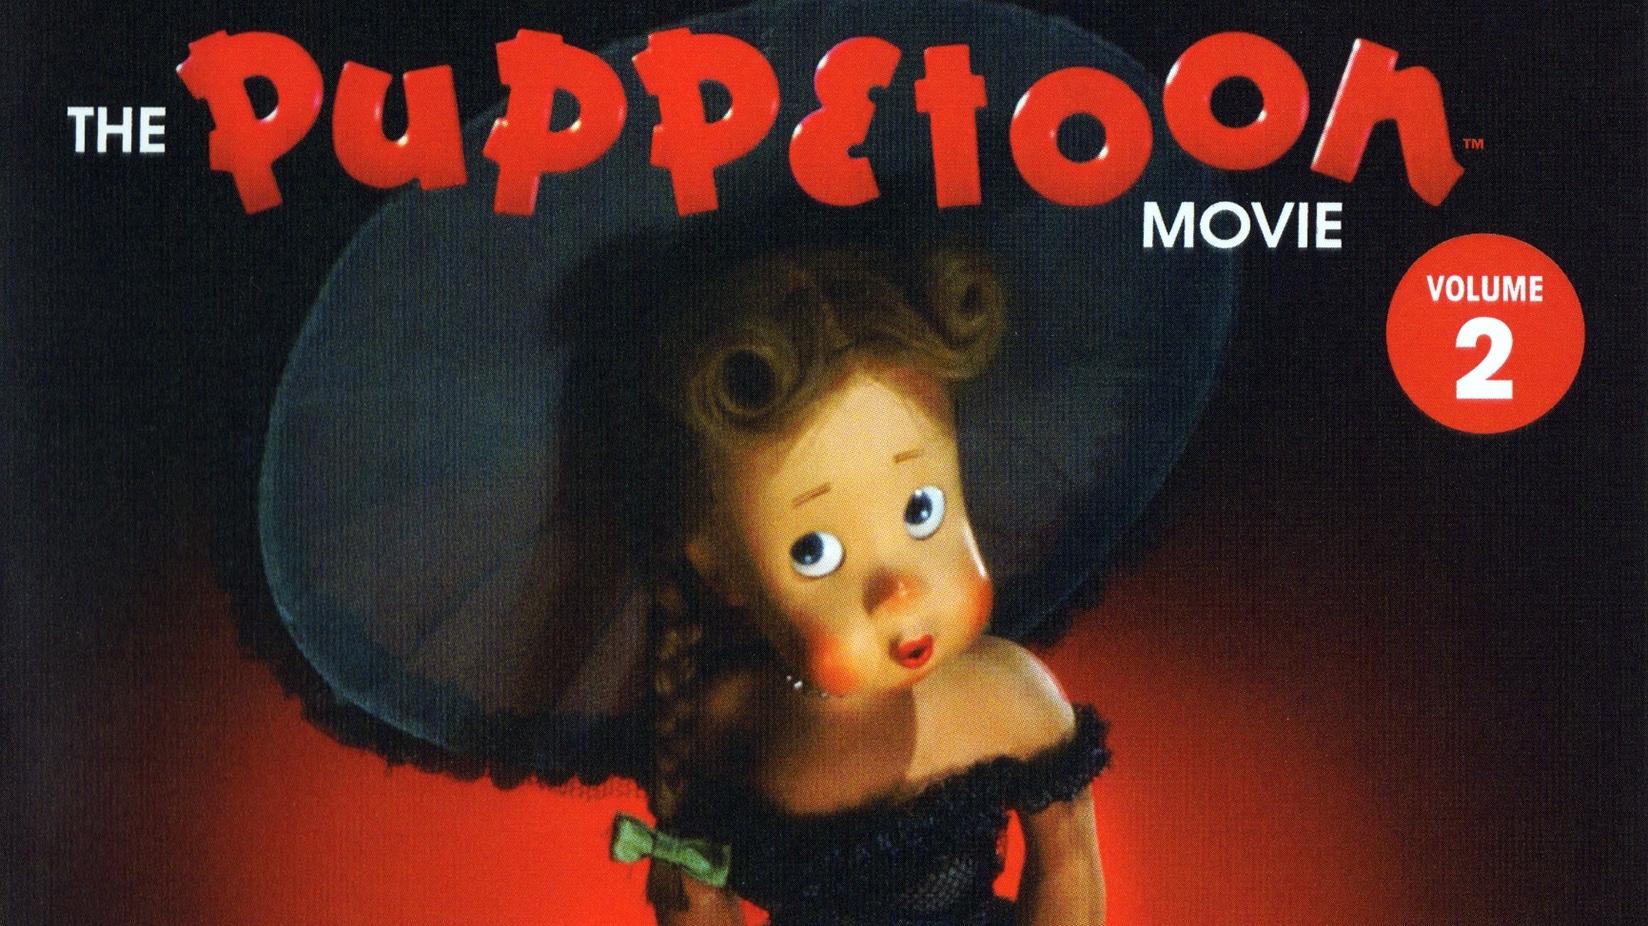 Now on Blu-ray: The Puppetoon Movie Volume 2